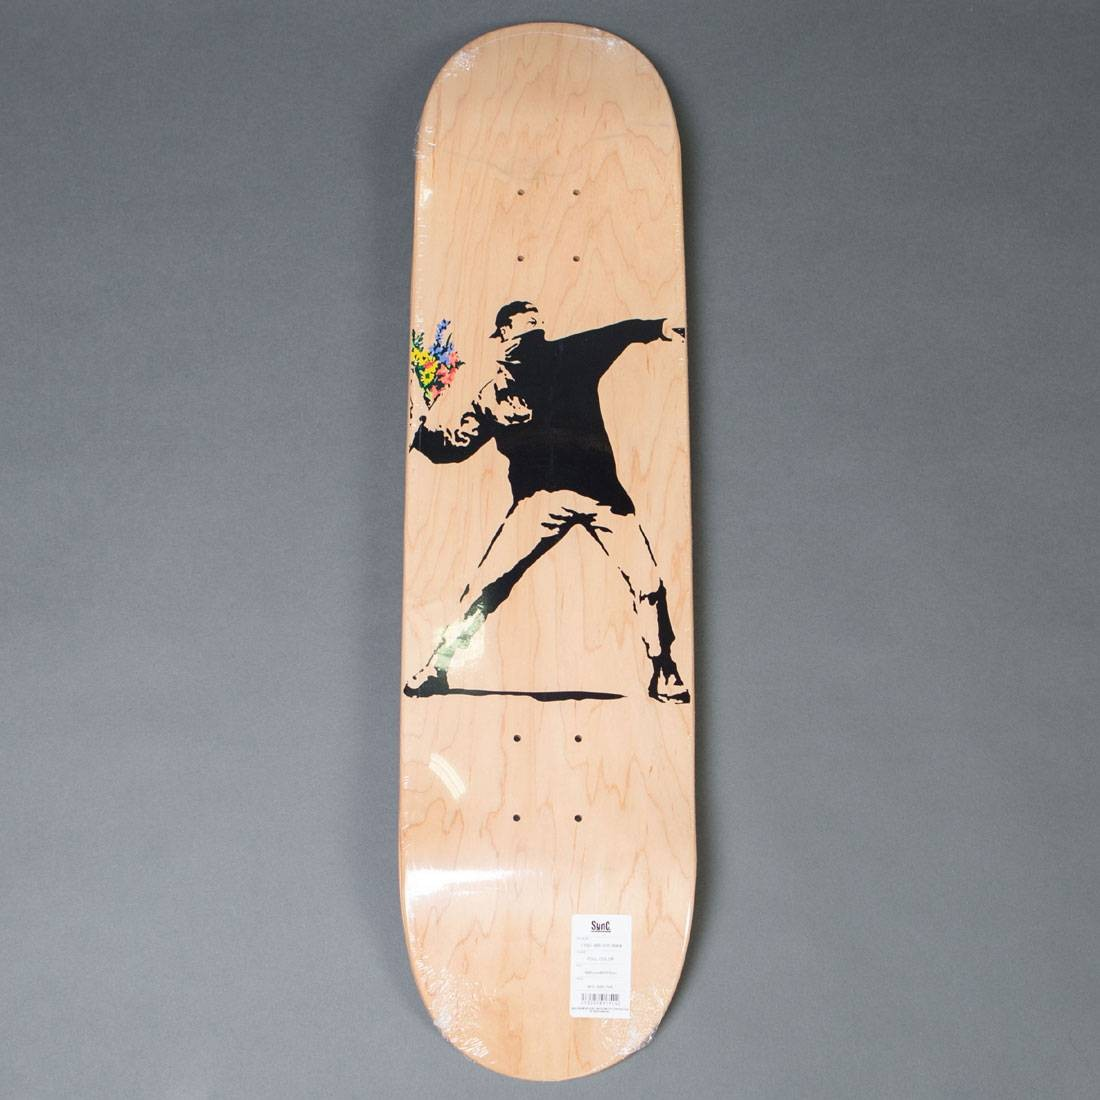 Medicom x SYNC Brandalism Flower Bomber Skateboard Deck (tan)